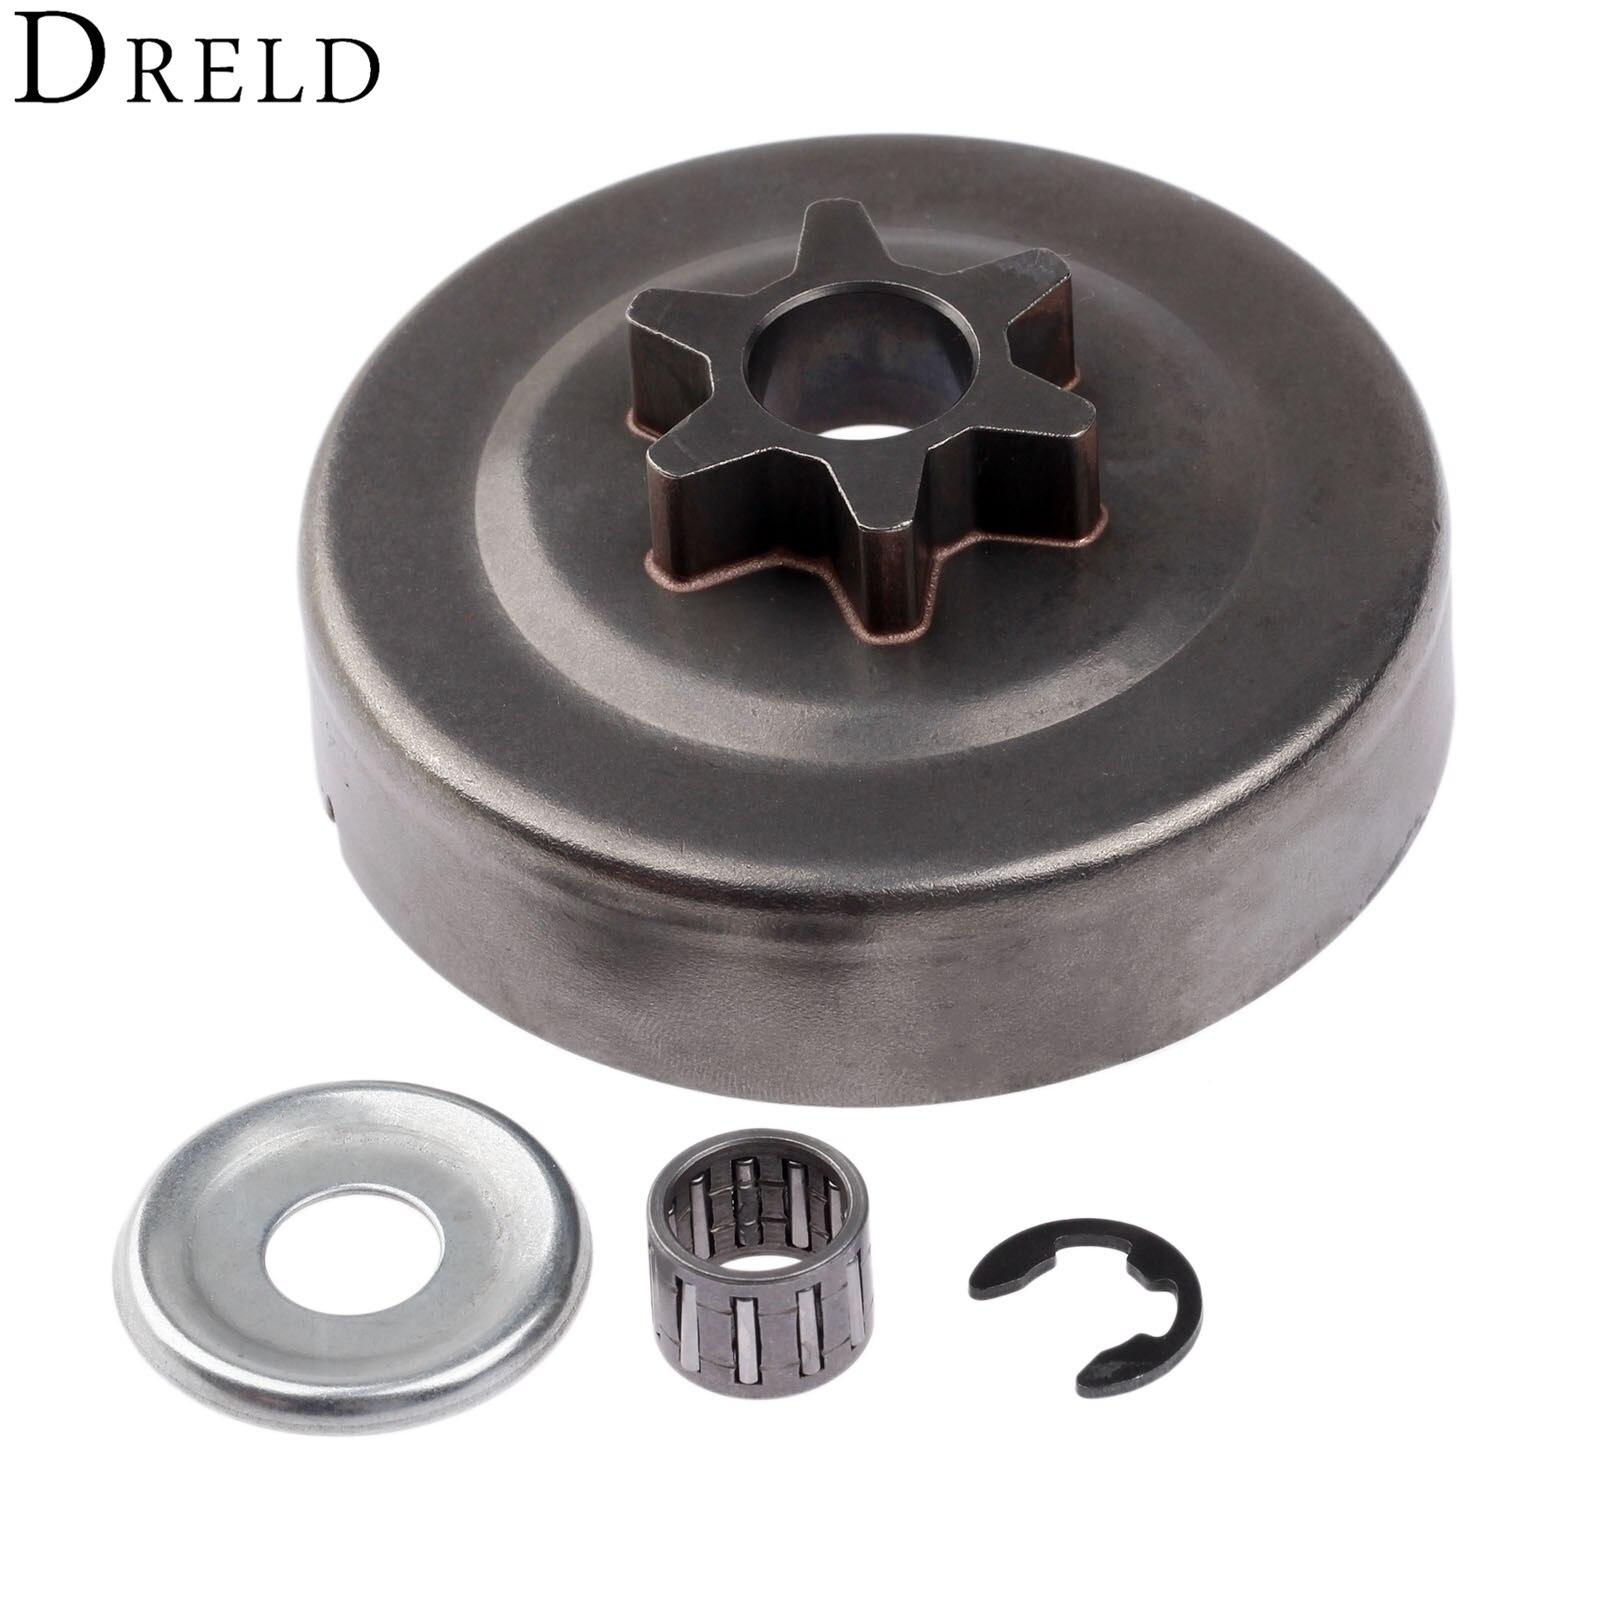 DRELD 3/8 6 T Kupplungsglocke Kettenrad Washer E-Clip Kit Für STIHL kettensäge 017 018 021 023 025 MS170 MS180 MS210 MS230 MS250 1123